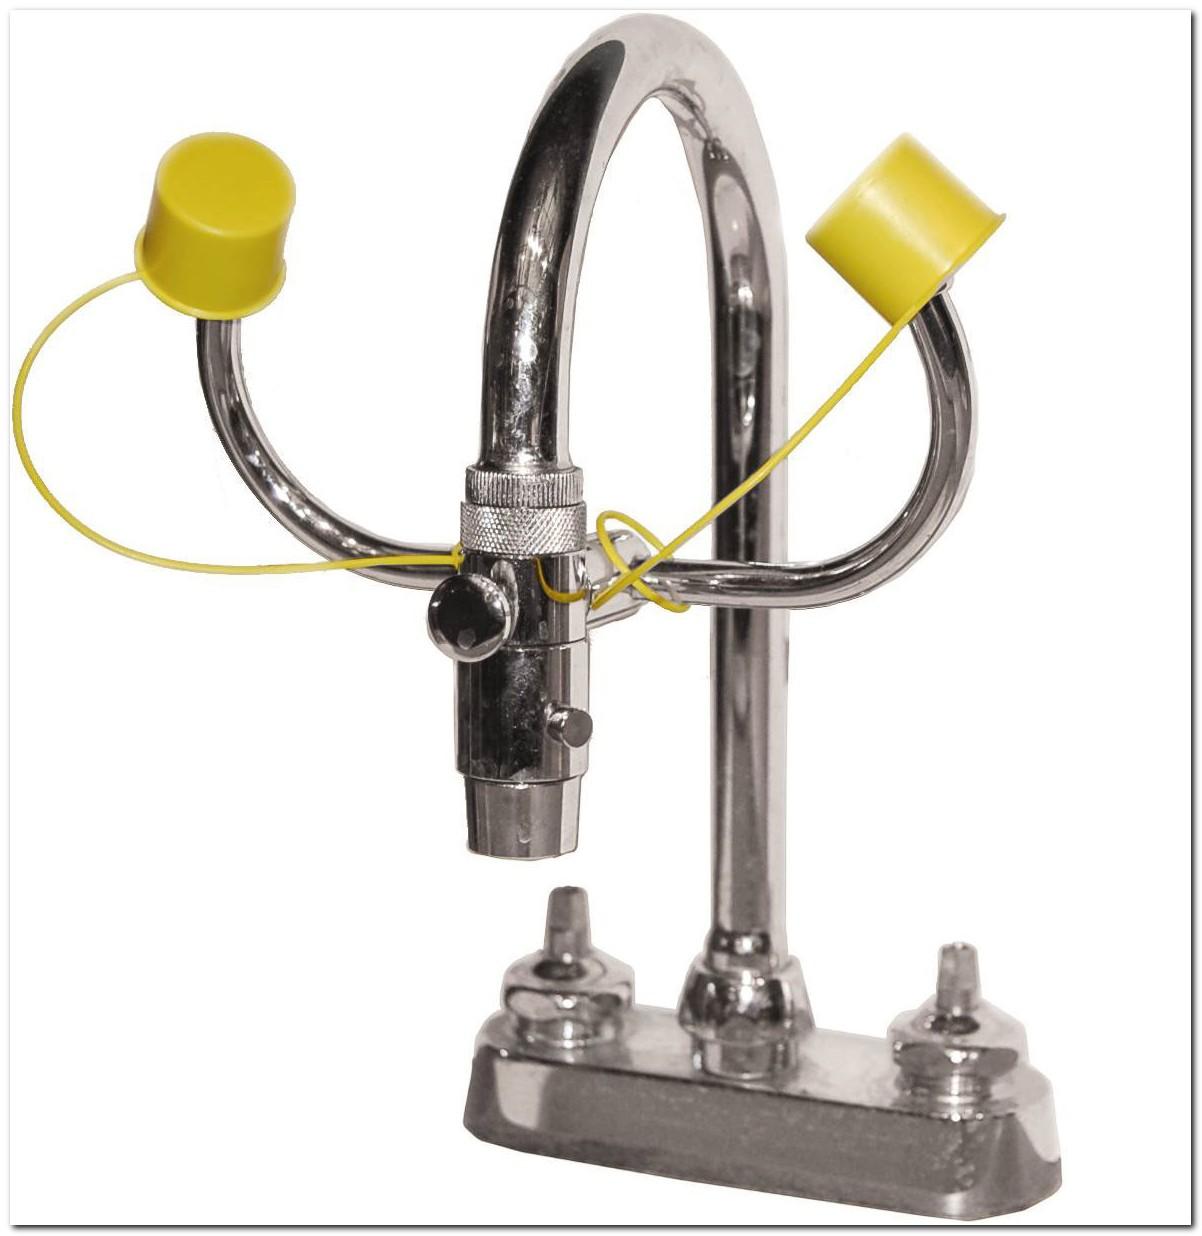 Faucet Mounted Emergency Eye Wash Station